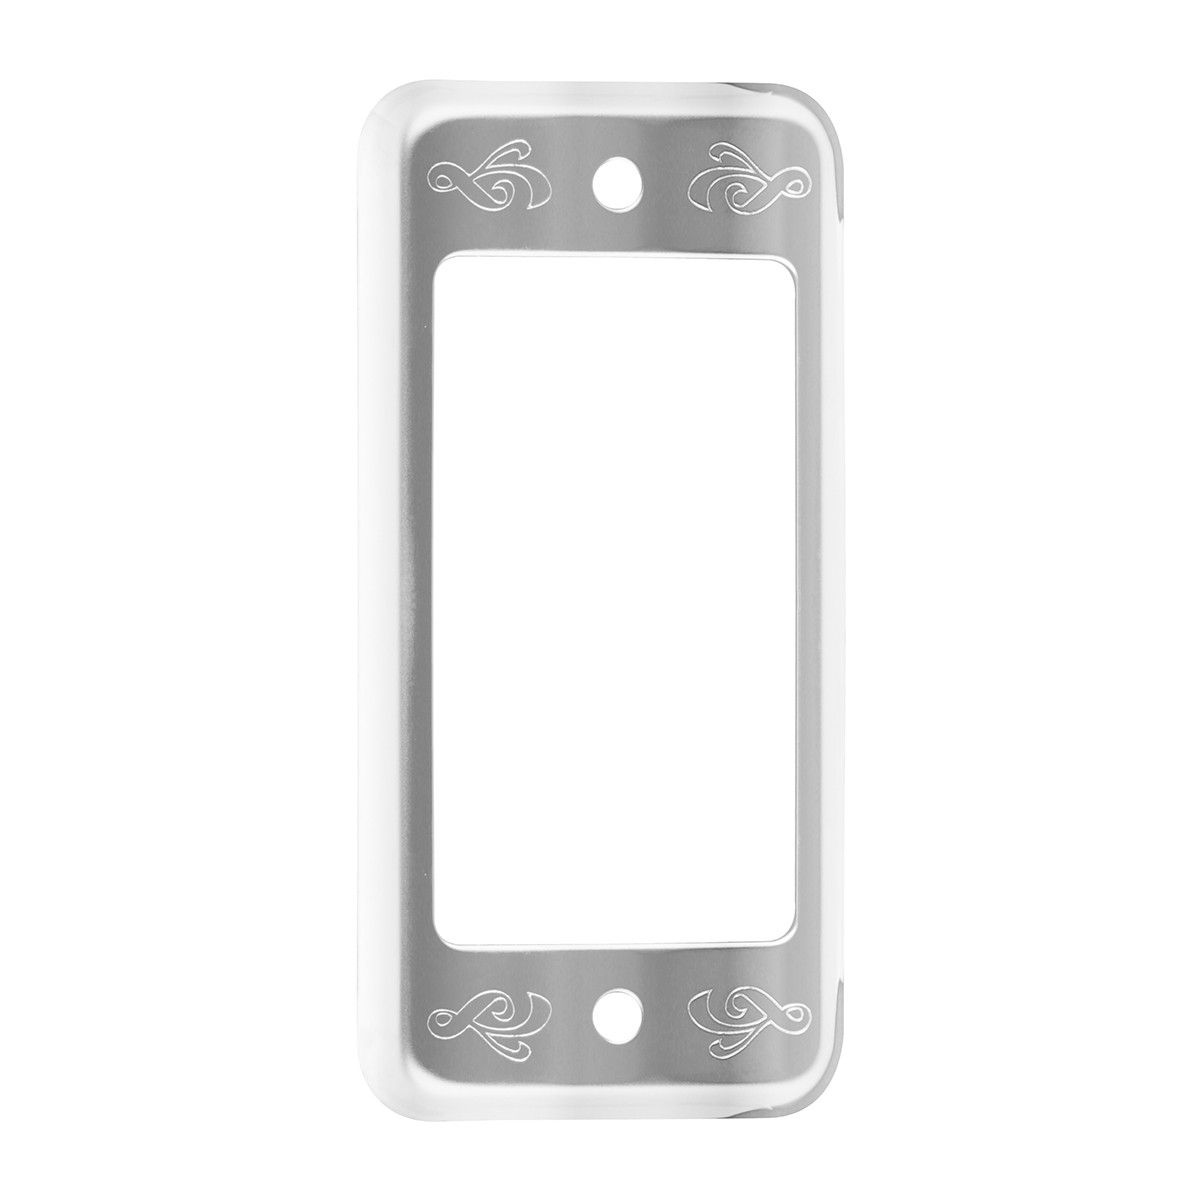 68330 Panel Pocket Cover for Peterbilt 379